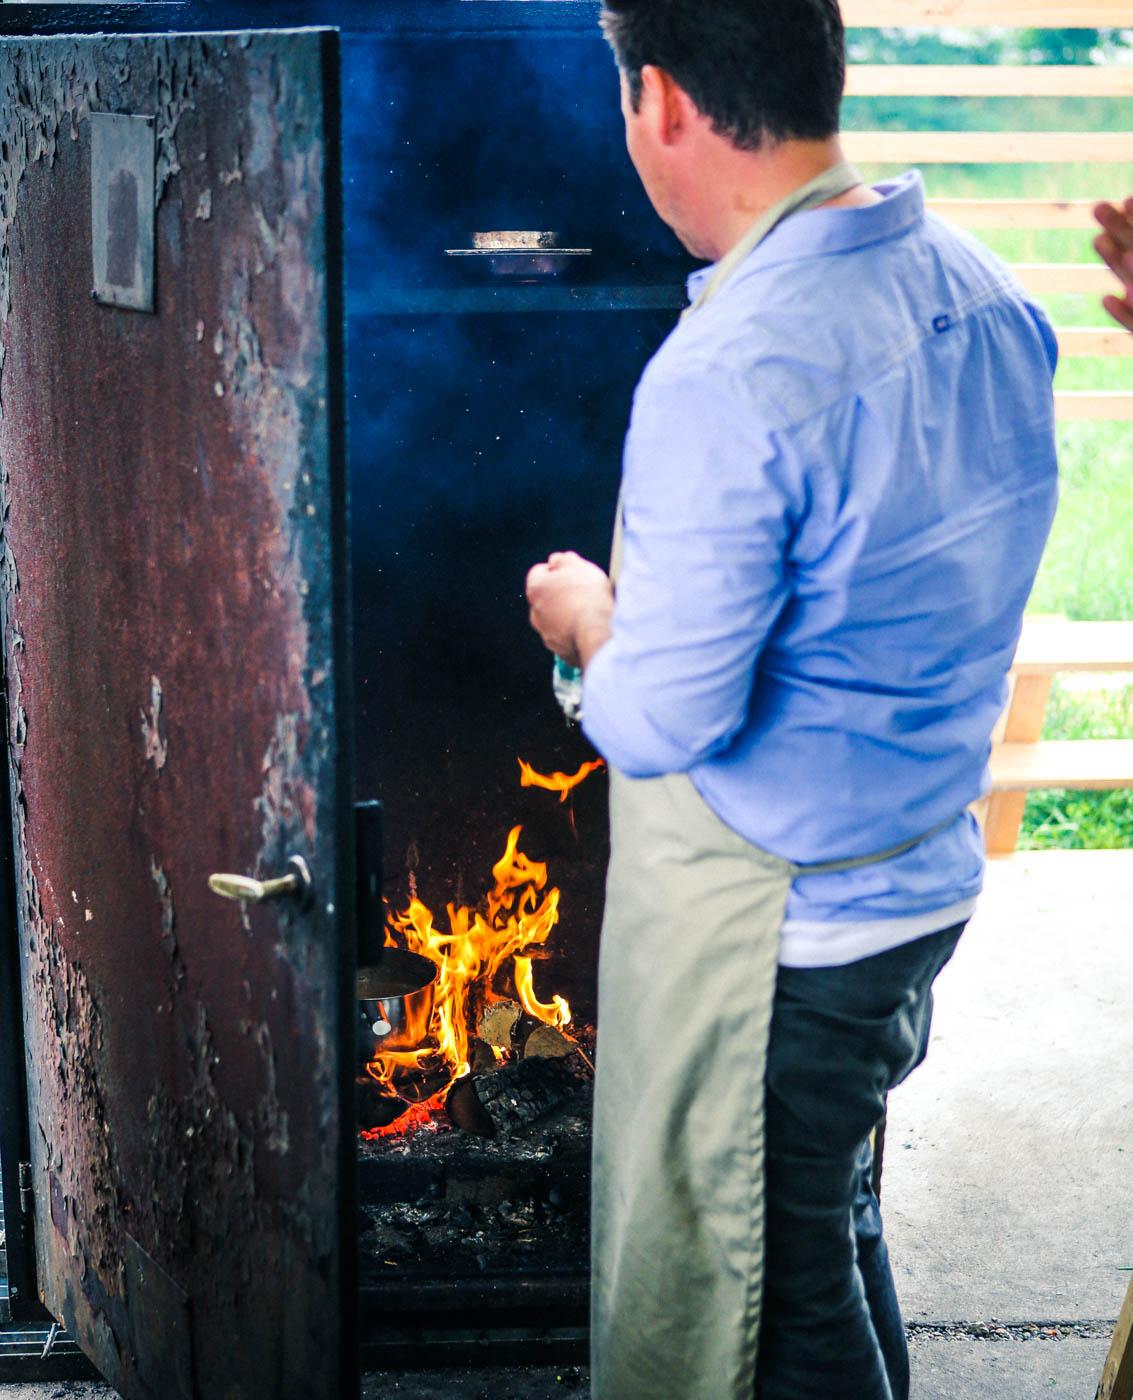 Full fart i röken Hörte Brygga i södra skåne